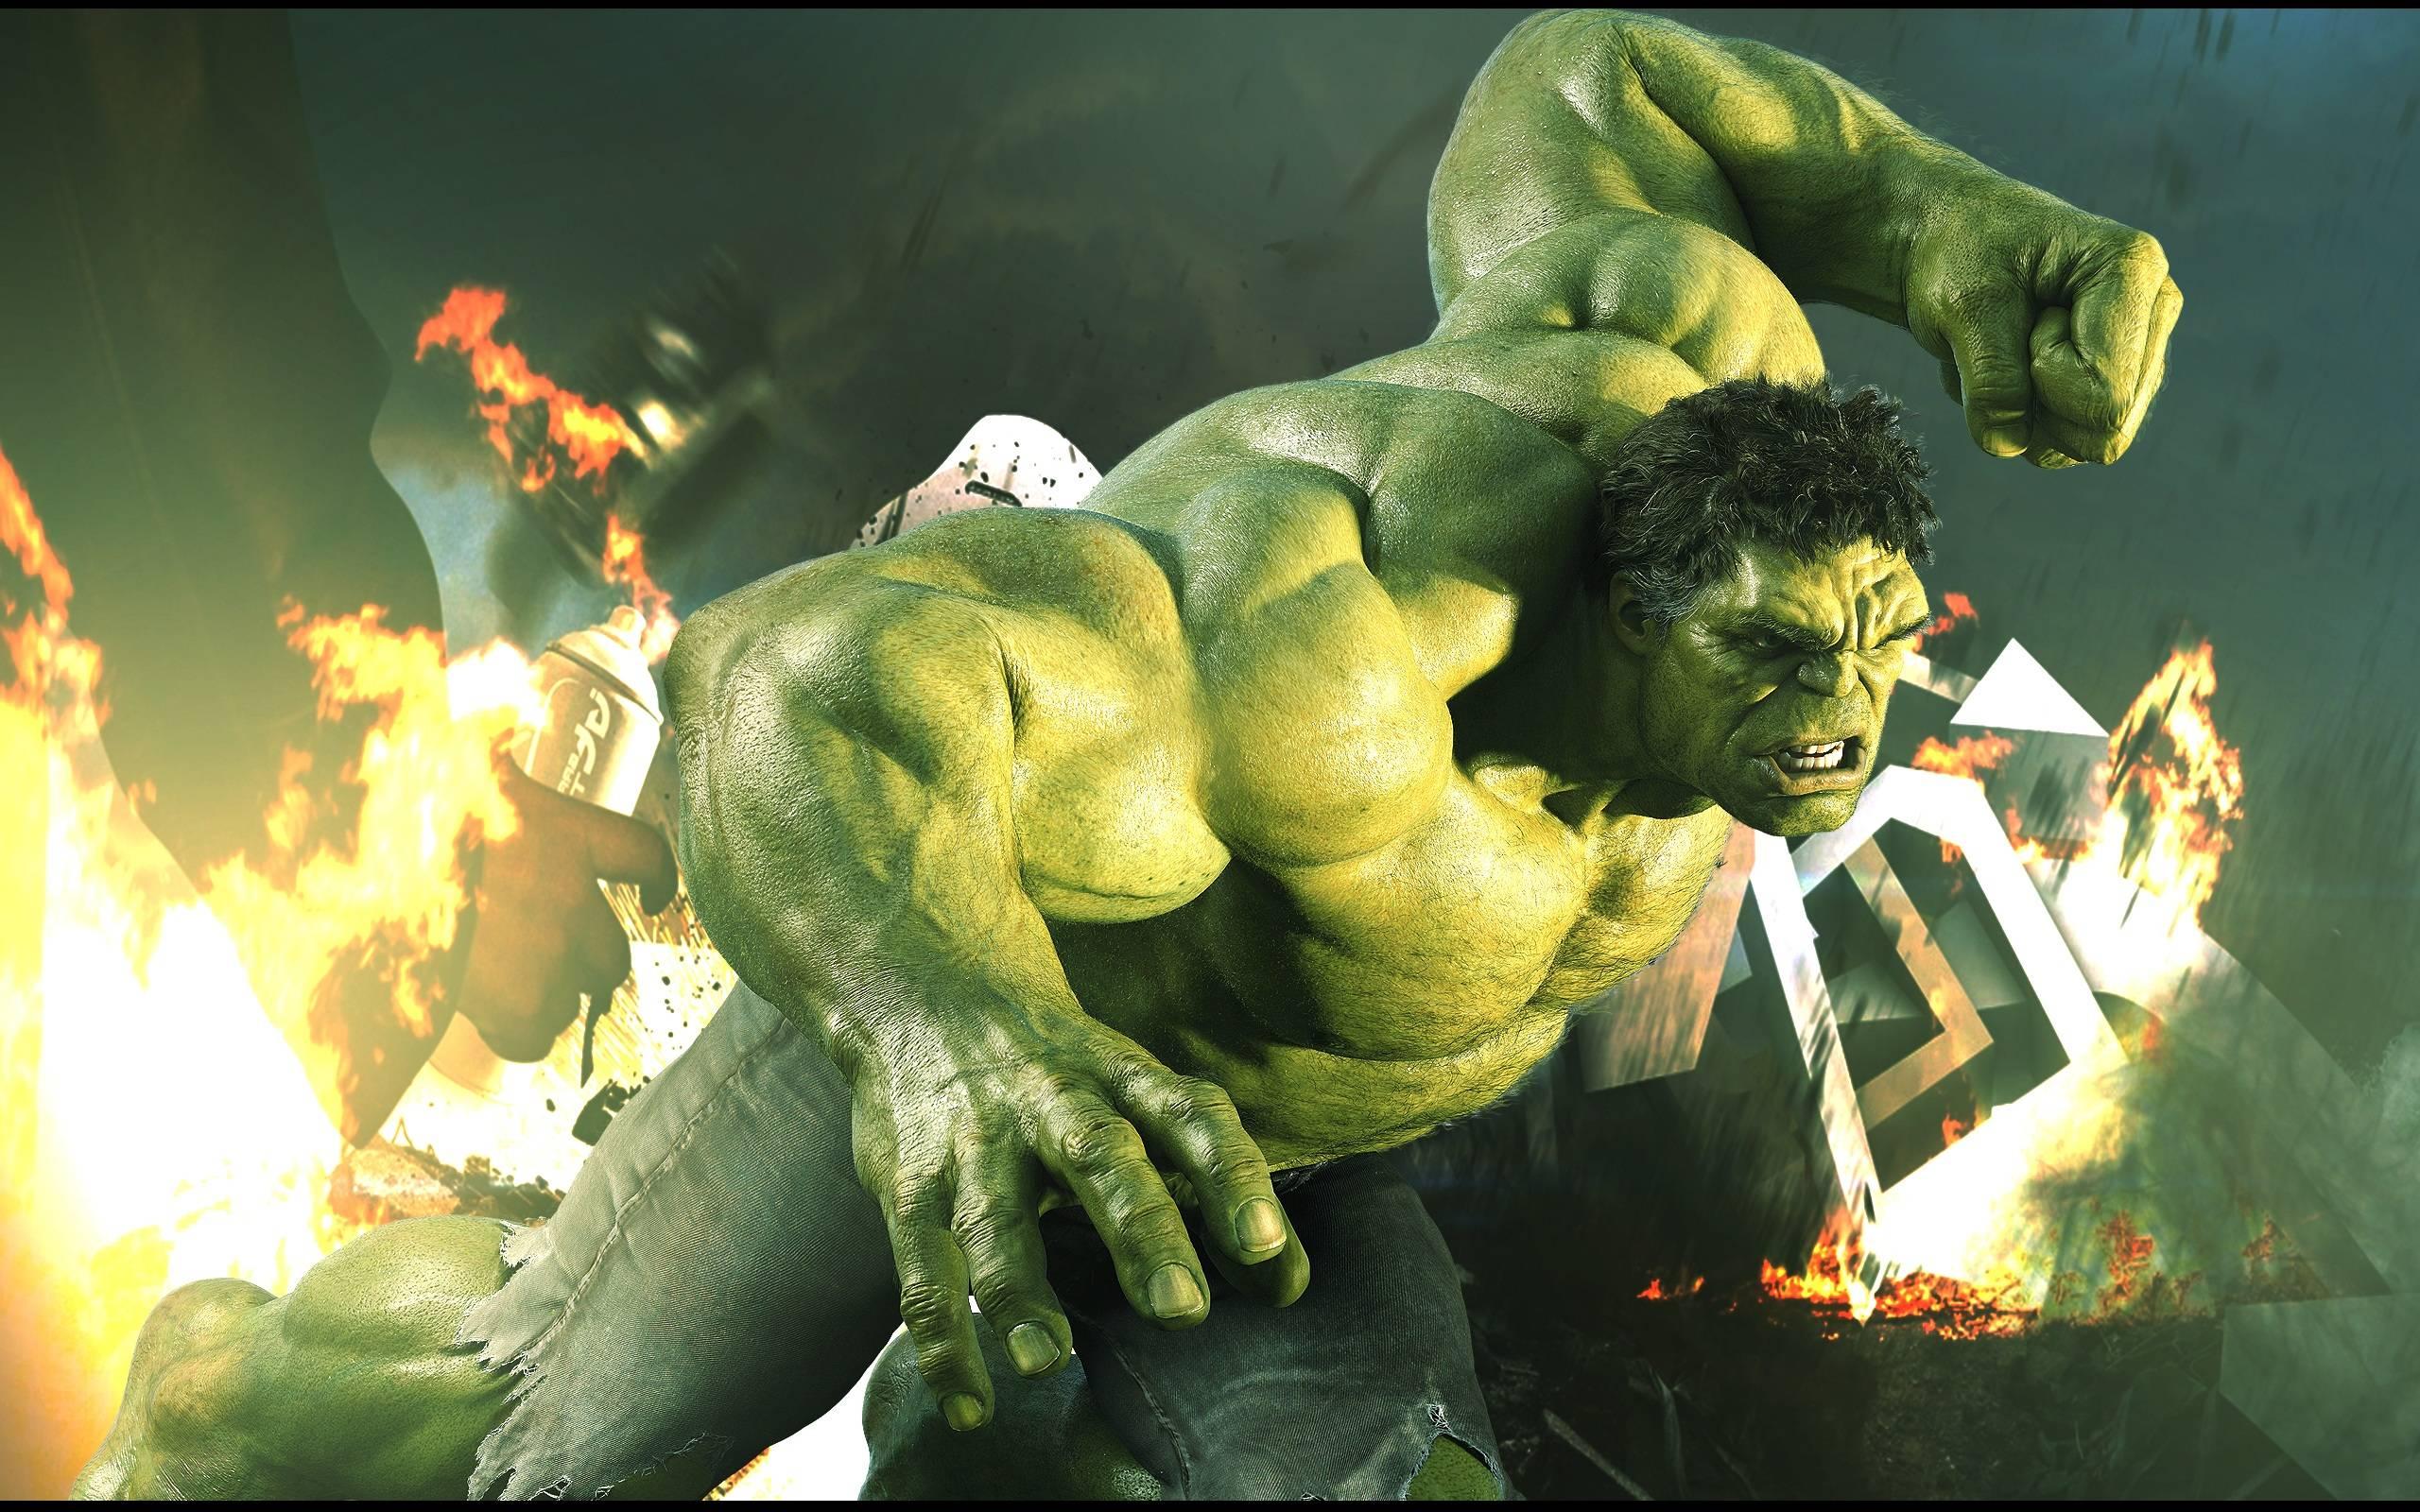 The hulk wallpaper   SF Wallpaper 2560x1600